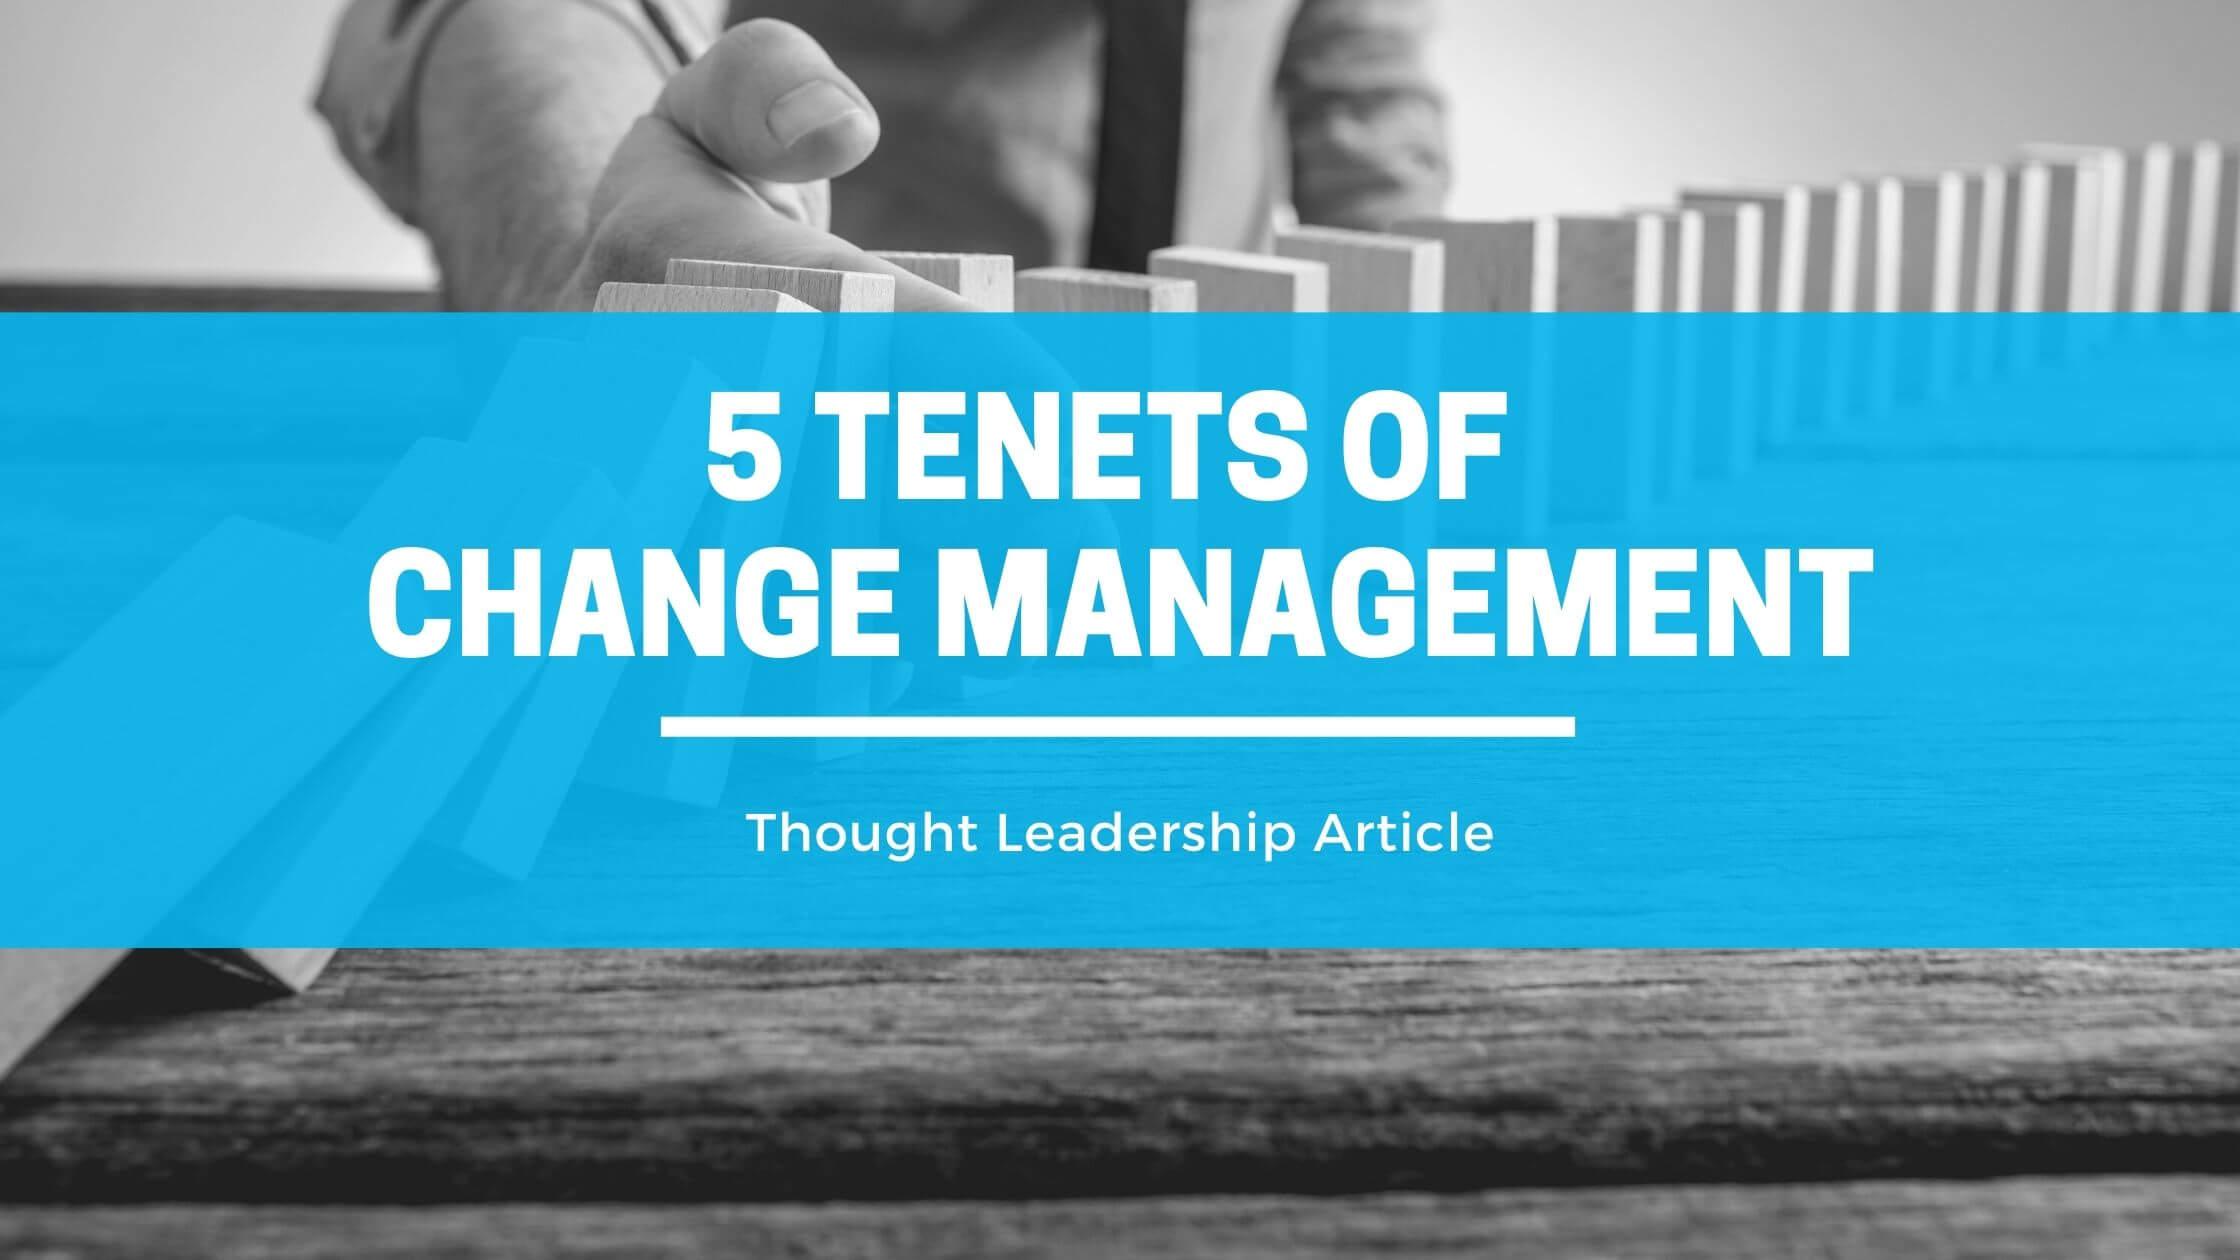 Principles of change management